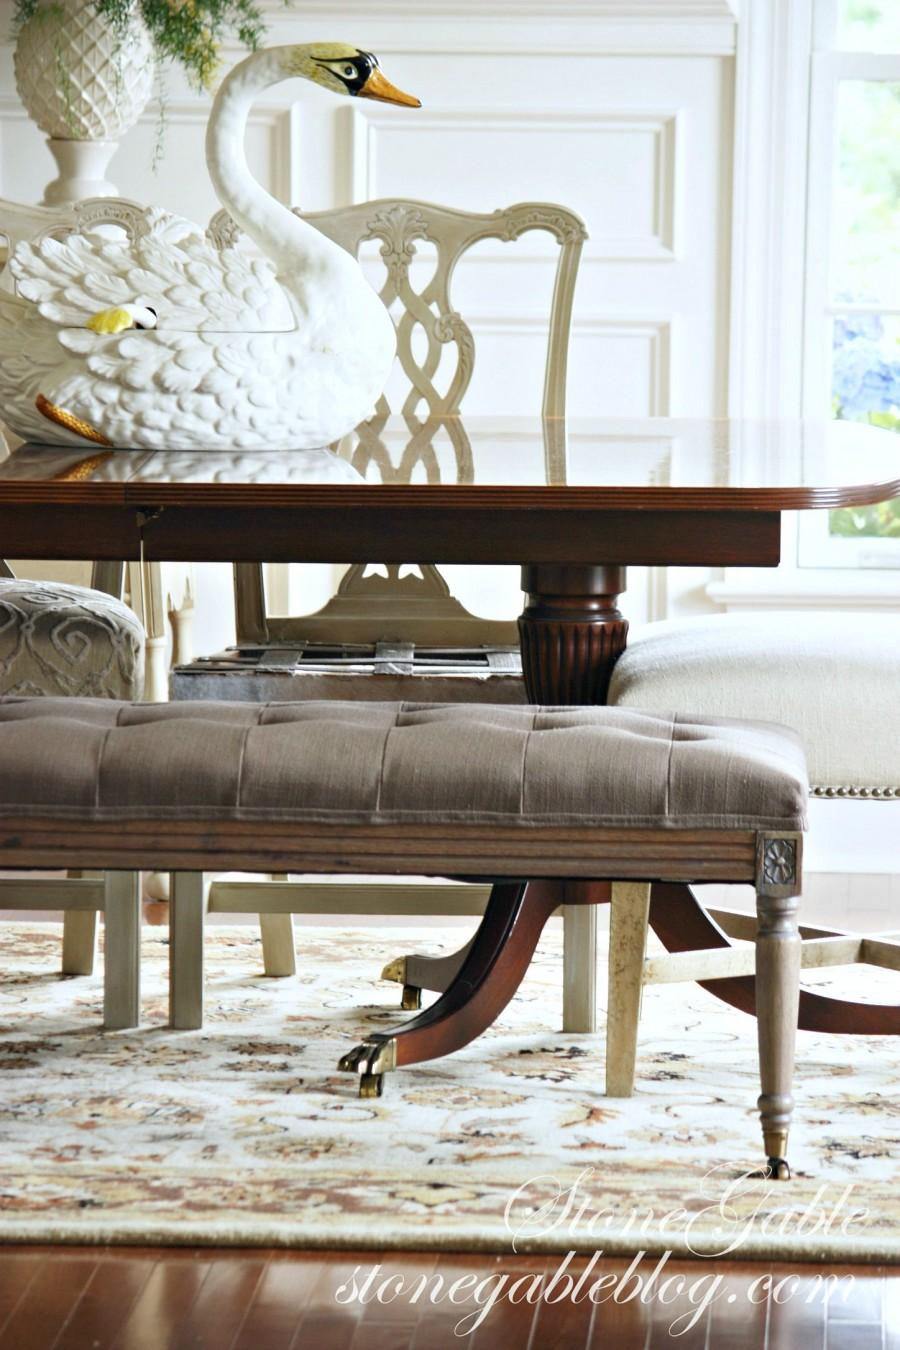 EVOLUTION OF A DINING ROOM-rug and bench-stonegableblog.com